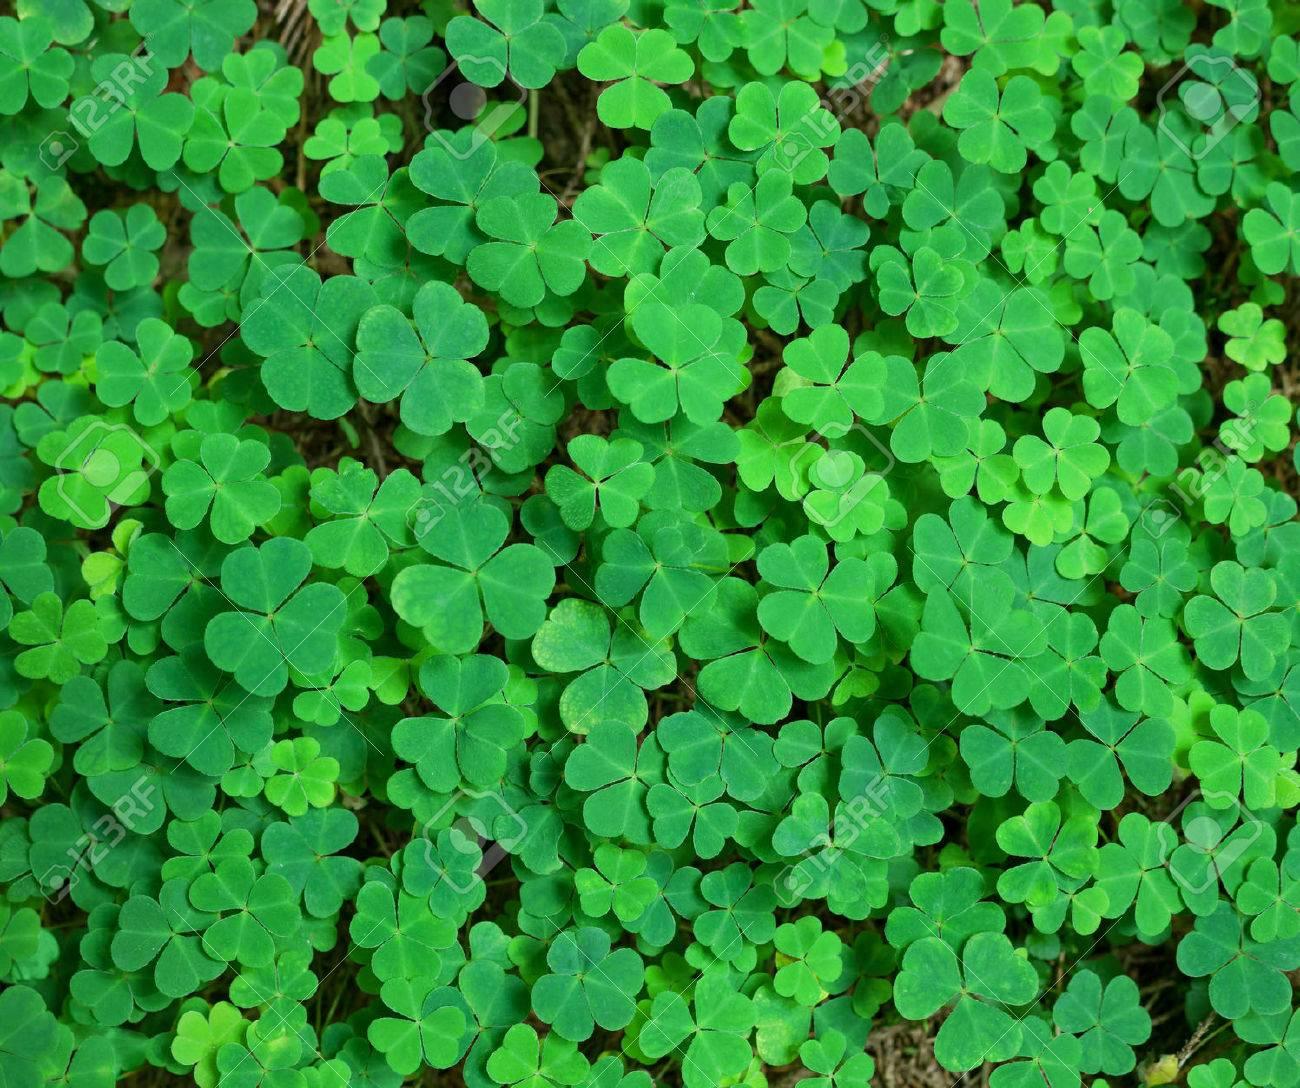 green background with three-leaved shamrocks. St.Patrick's day holiday symbol. - 36564730